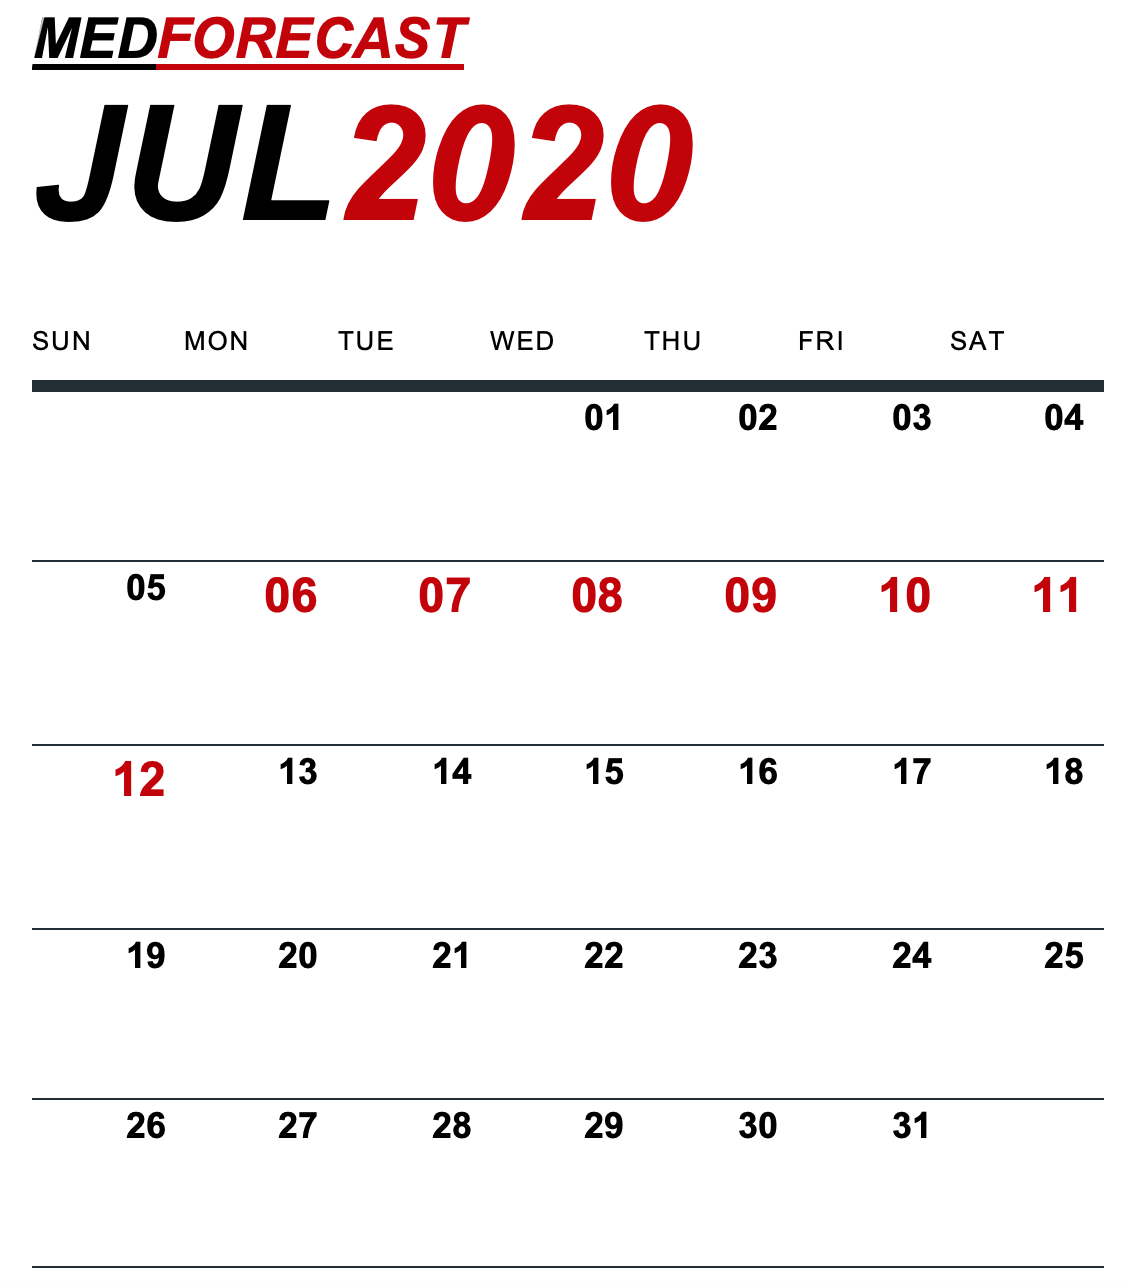 Medical News Forecast for July 6-12